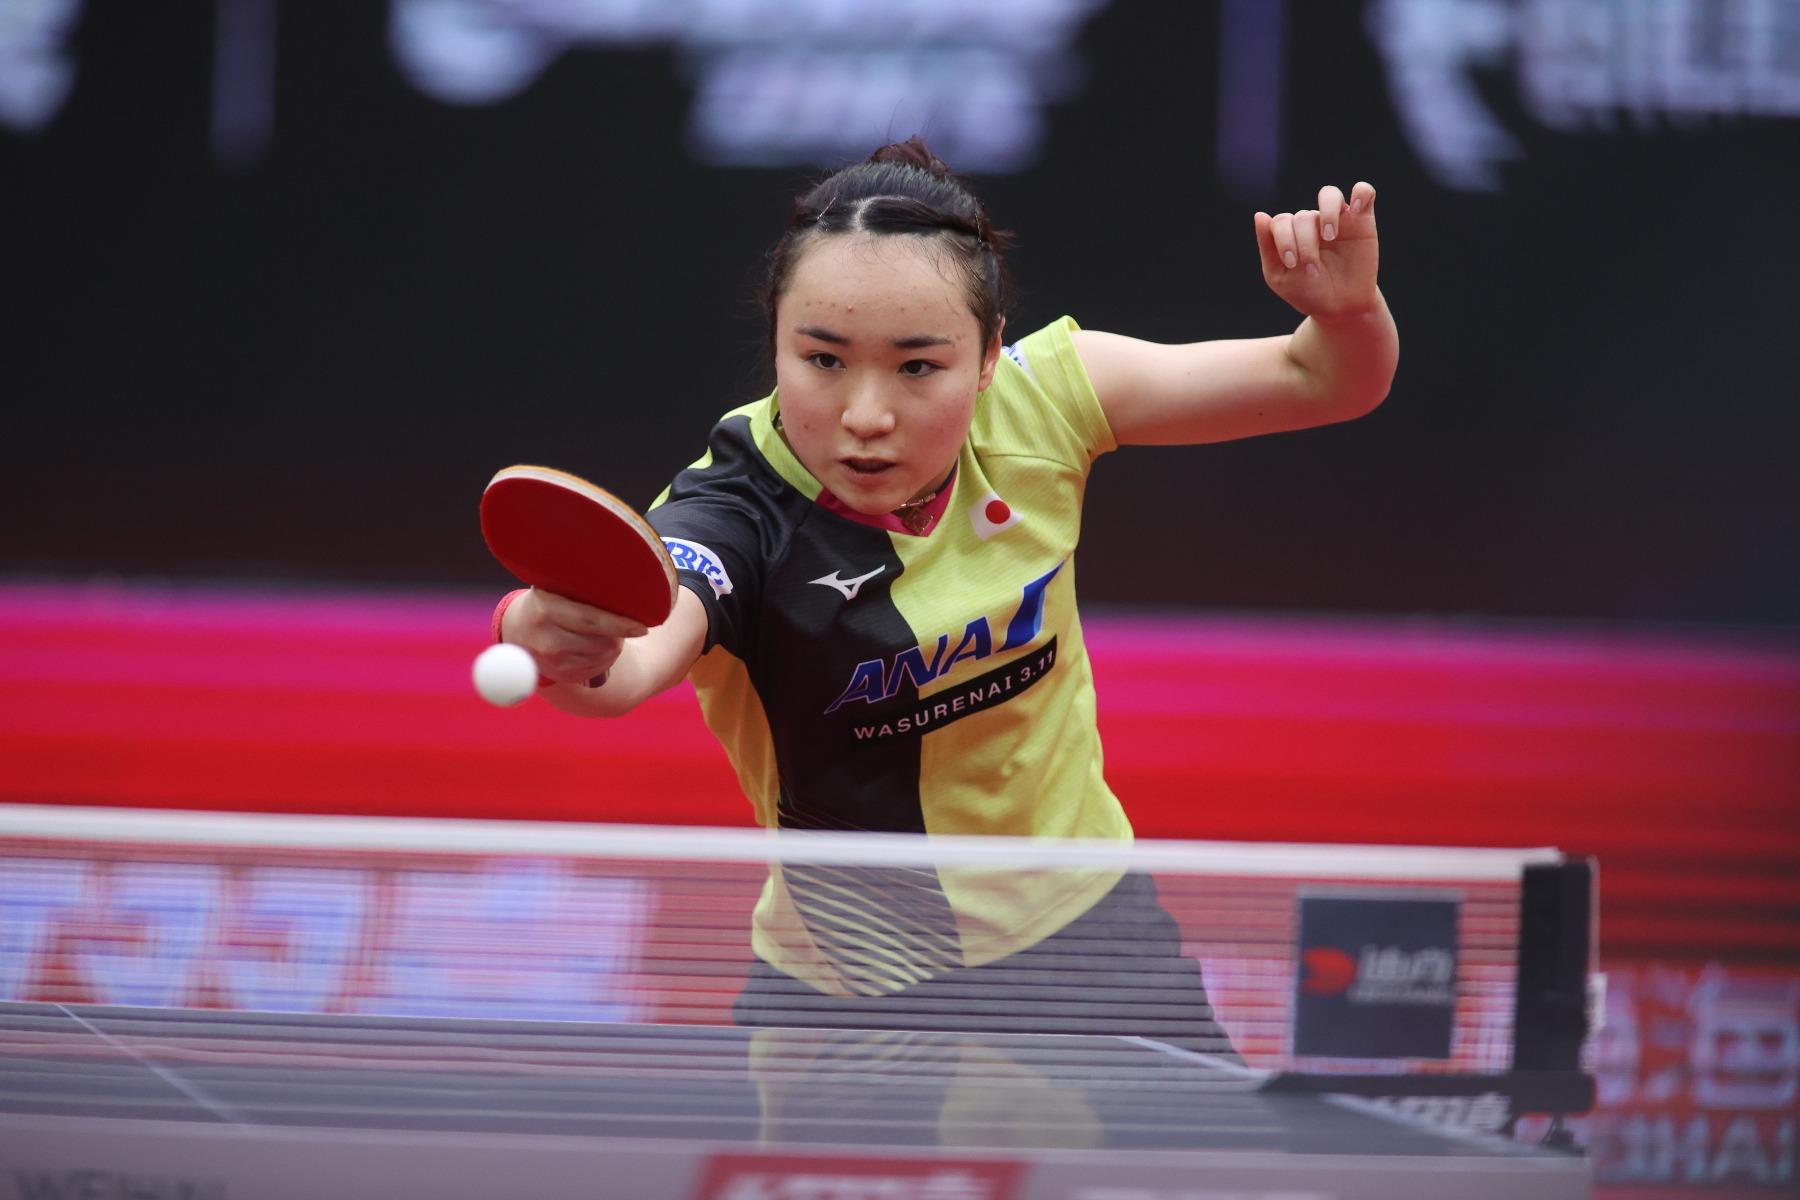 VICTAS VICTAS JOURNAL 卓球 2020女子ワールドカップ 伊藤美誠